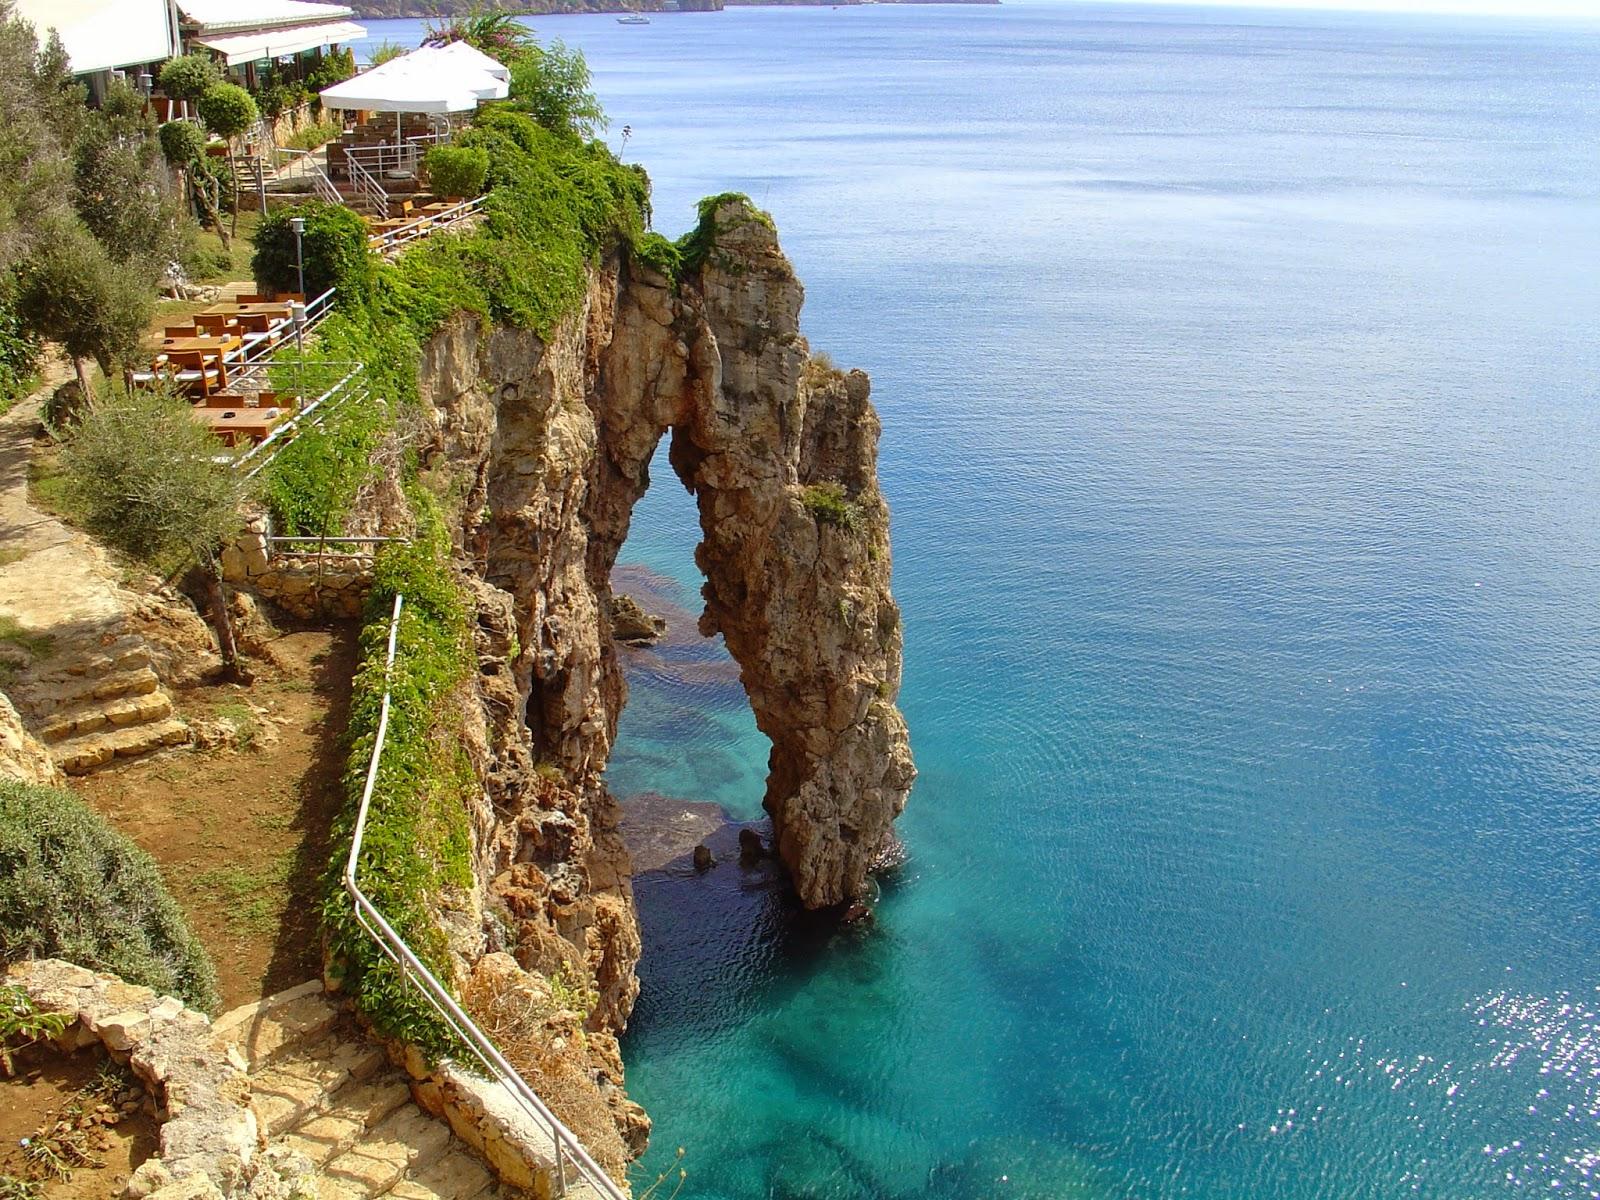 صور من انطاليا